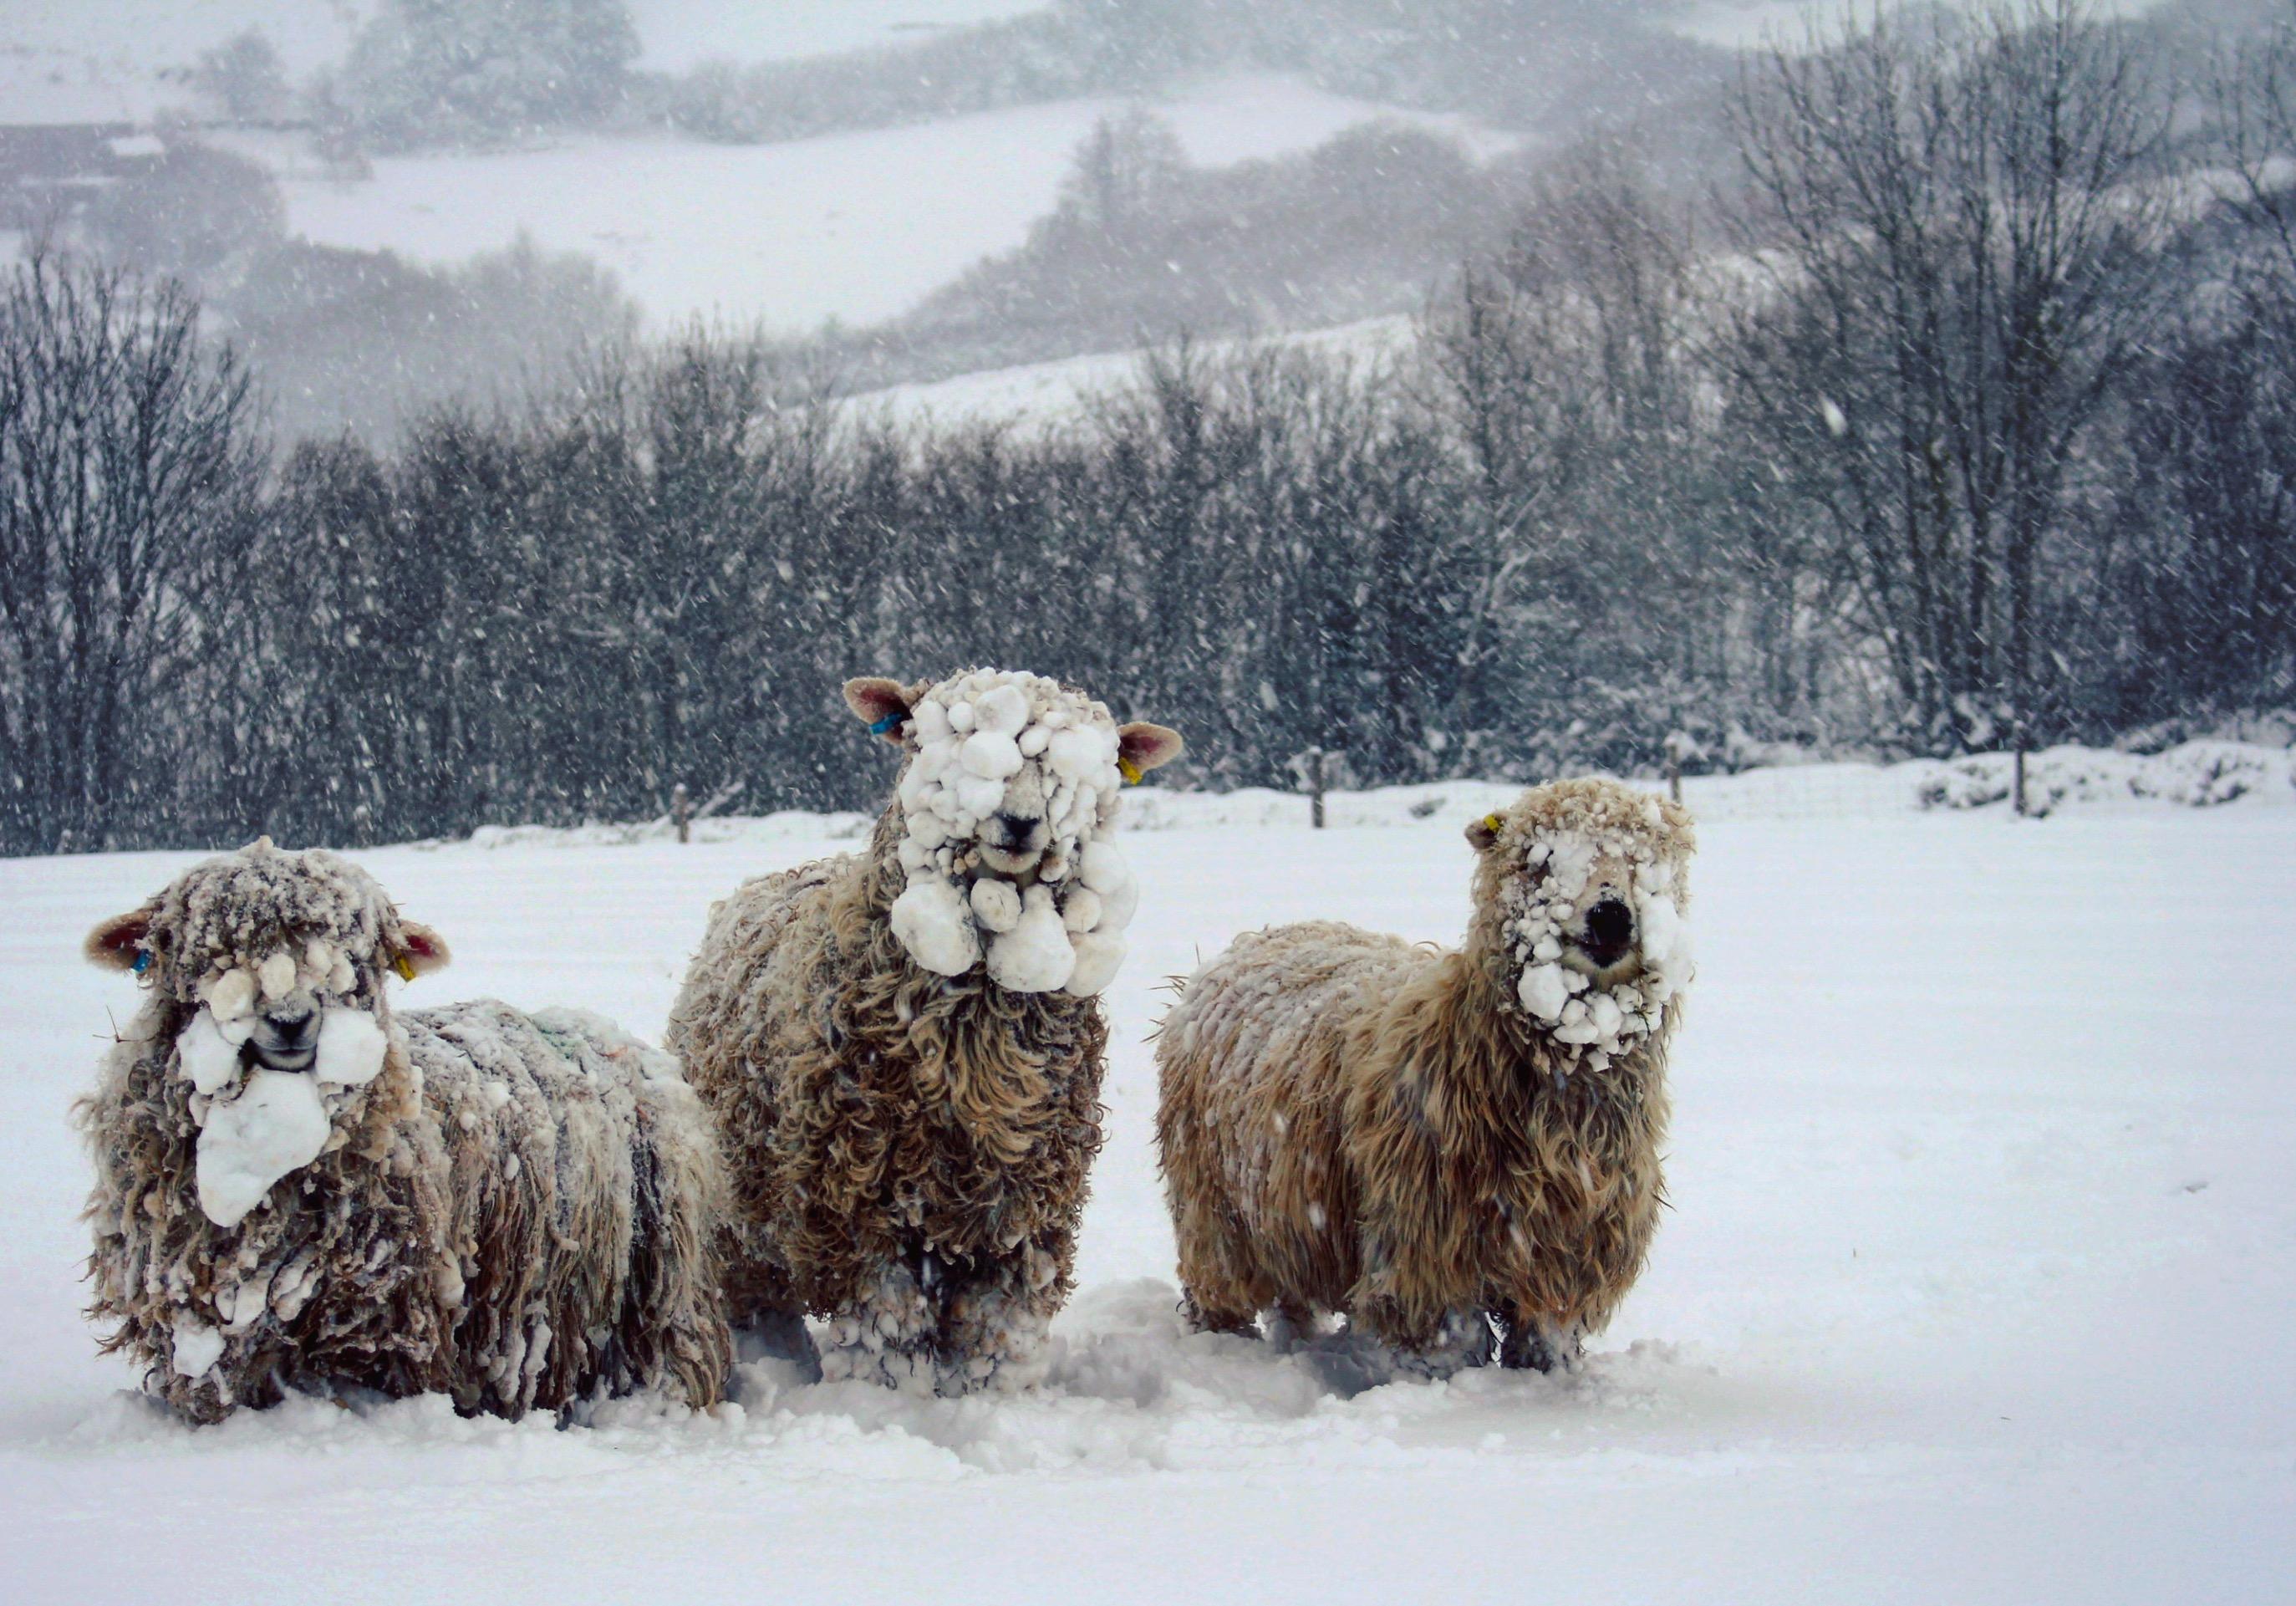 Dartmoor sheep in the snow